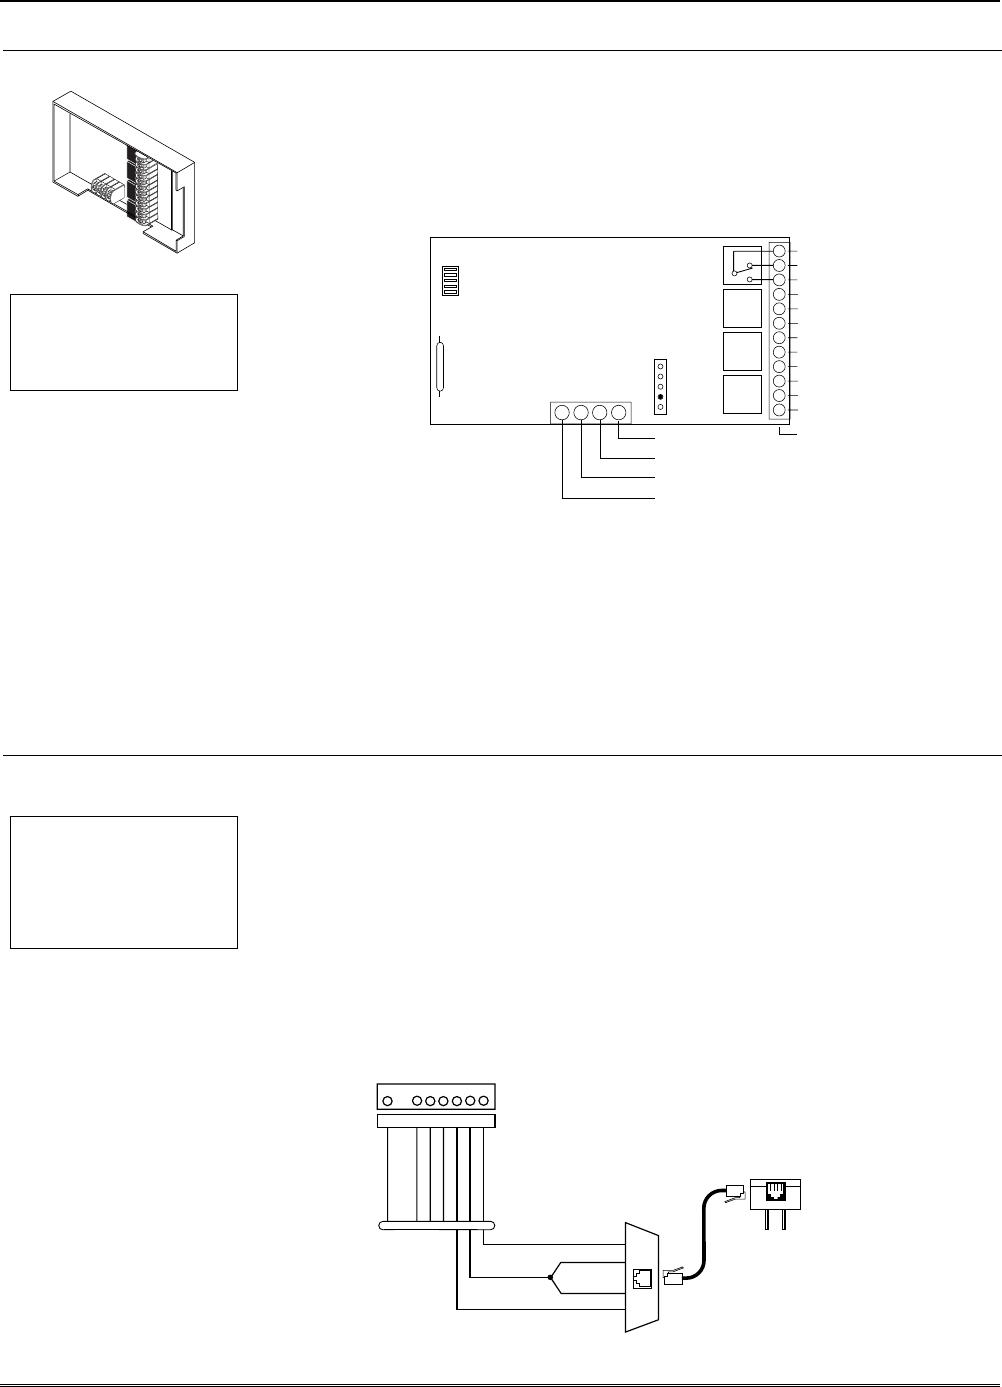 Honeywell Ademco Vista 15P Users Manual K5305 1v5_ii